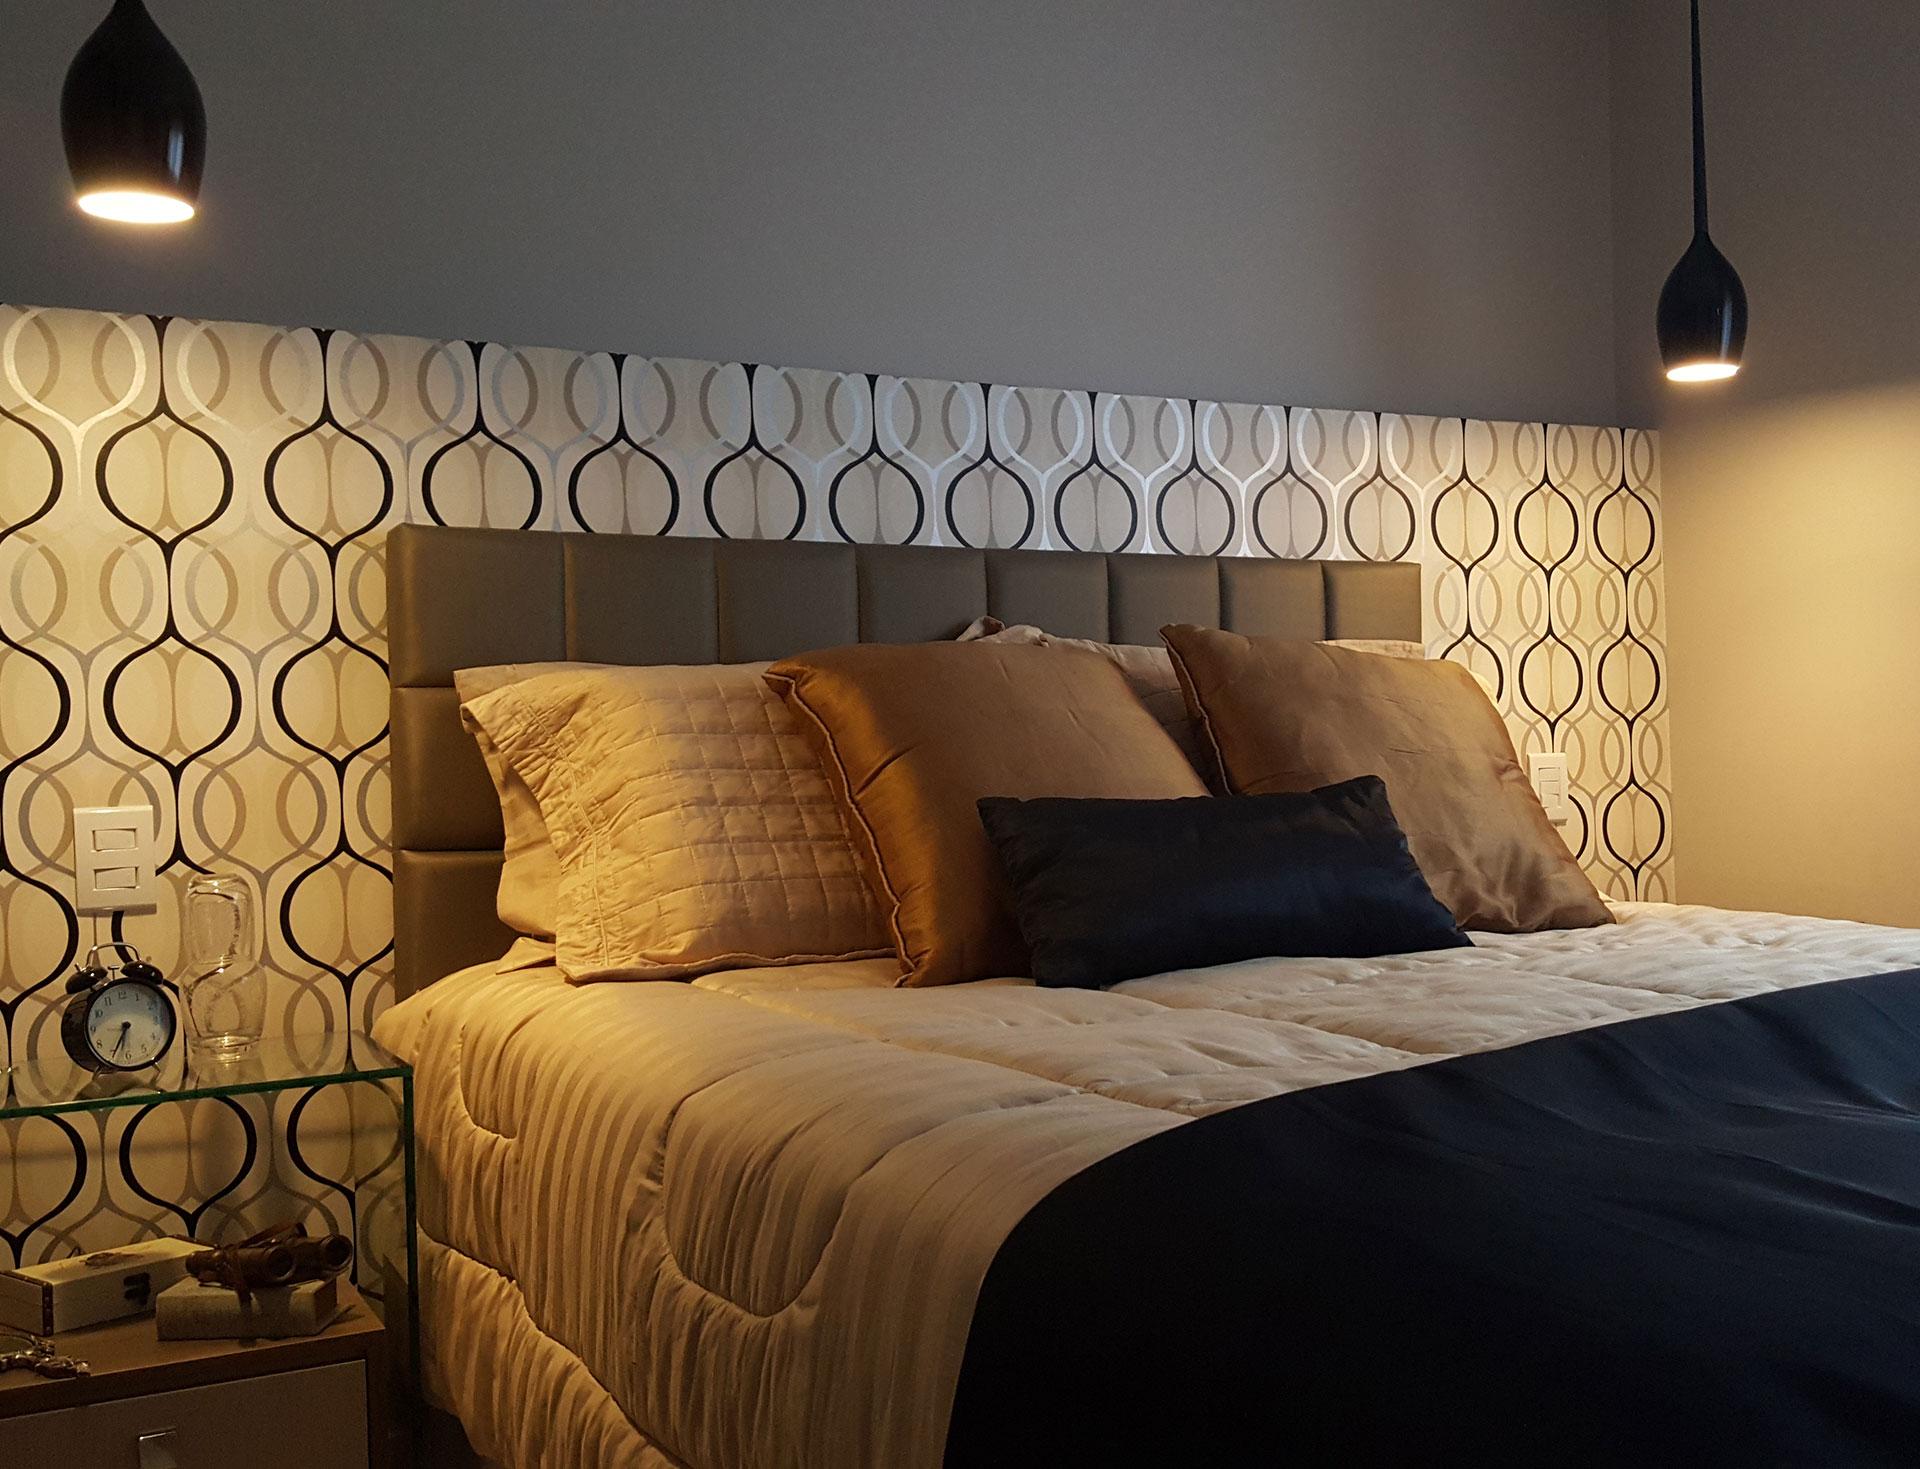 portfolio-cynthia-rolnik-apartamento4-capa